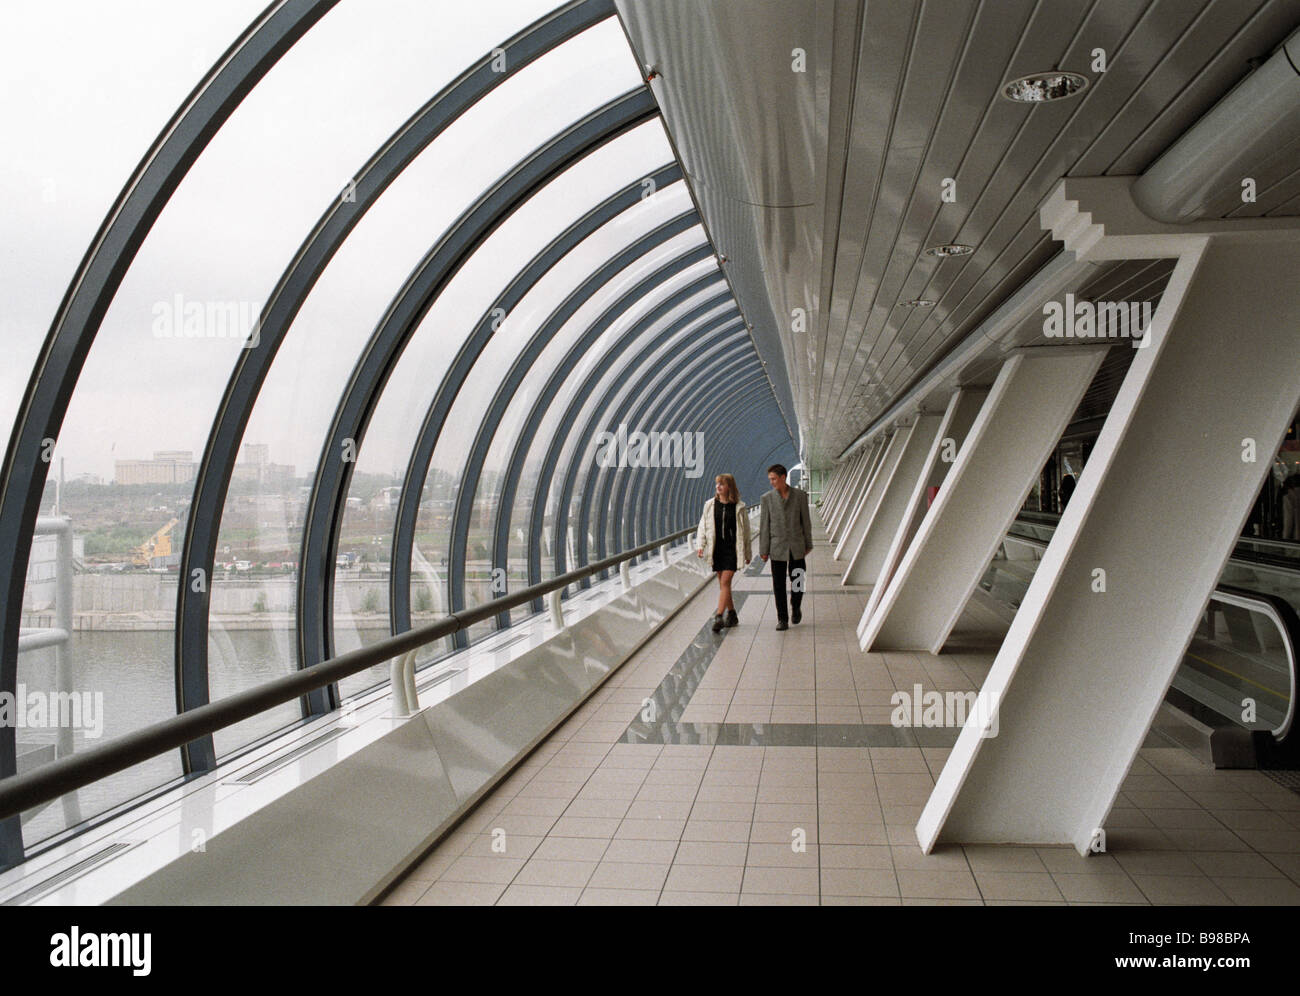 Bagration pedestrian bridge and shopping mall links Kutuzov Avenue and Krasnopresnenskaya Embankment - Stock Image